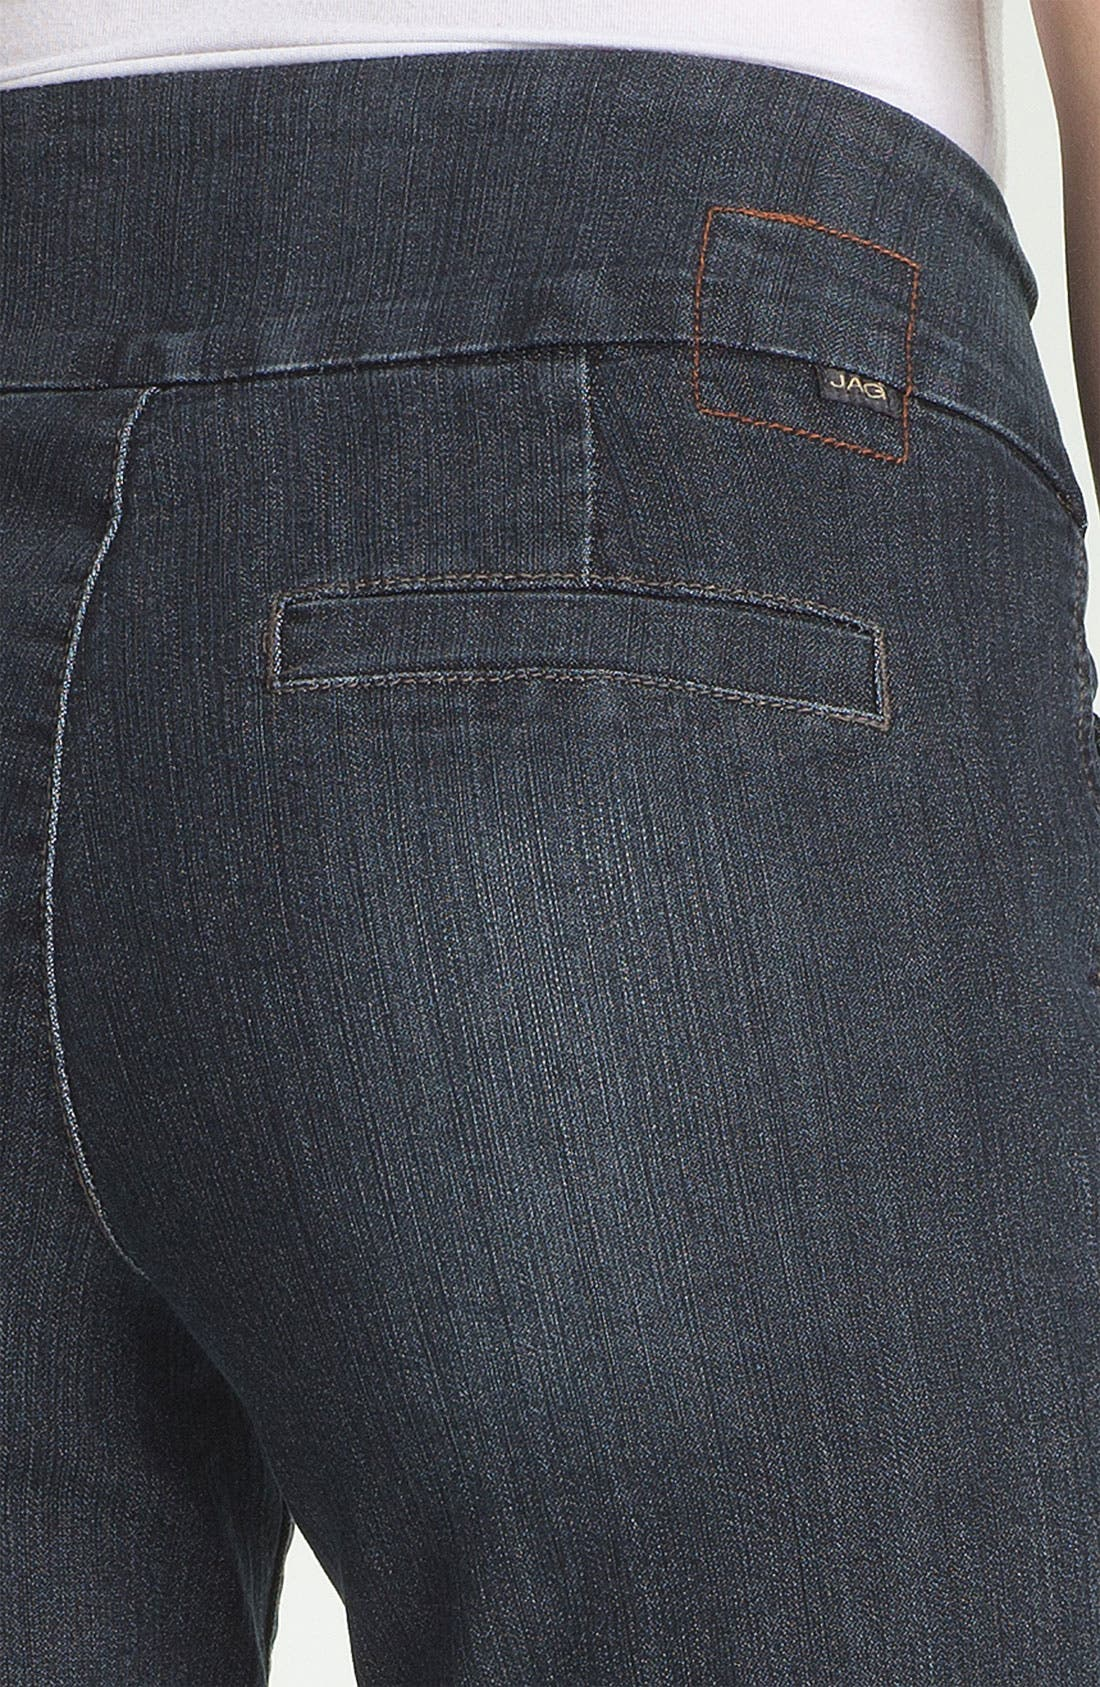 Alternate Image 3  - Jag Jeans 'Louie' Bermuda Shorts (Regular)